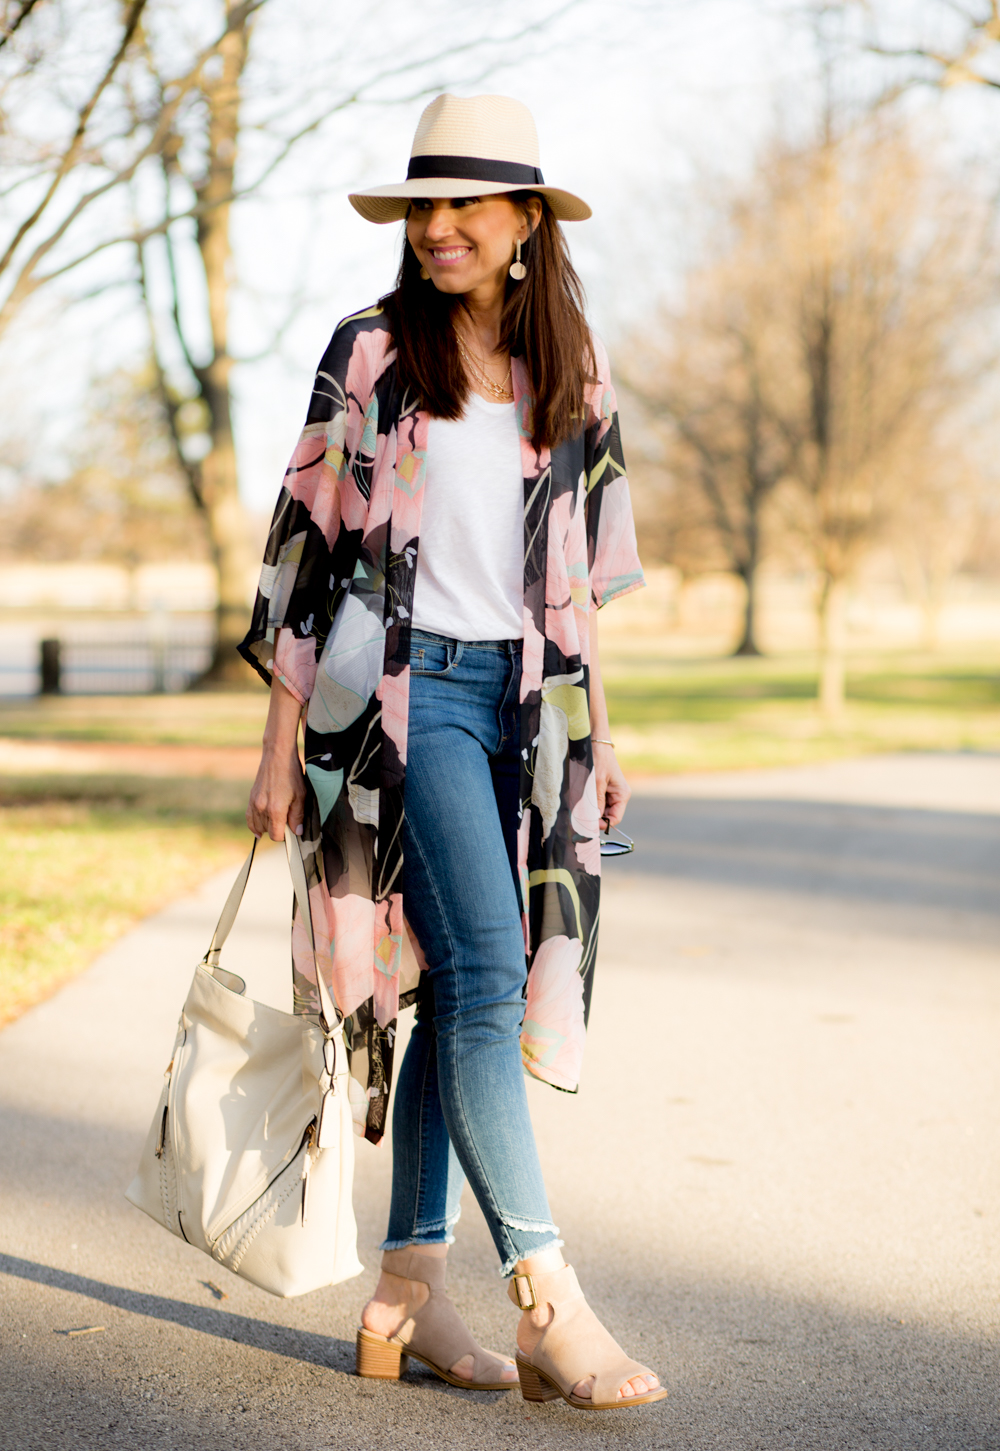 Kimono Trend from Sole Society